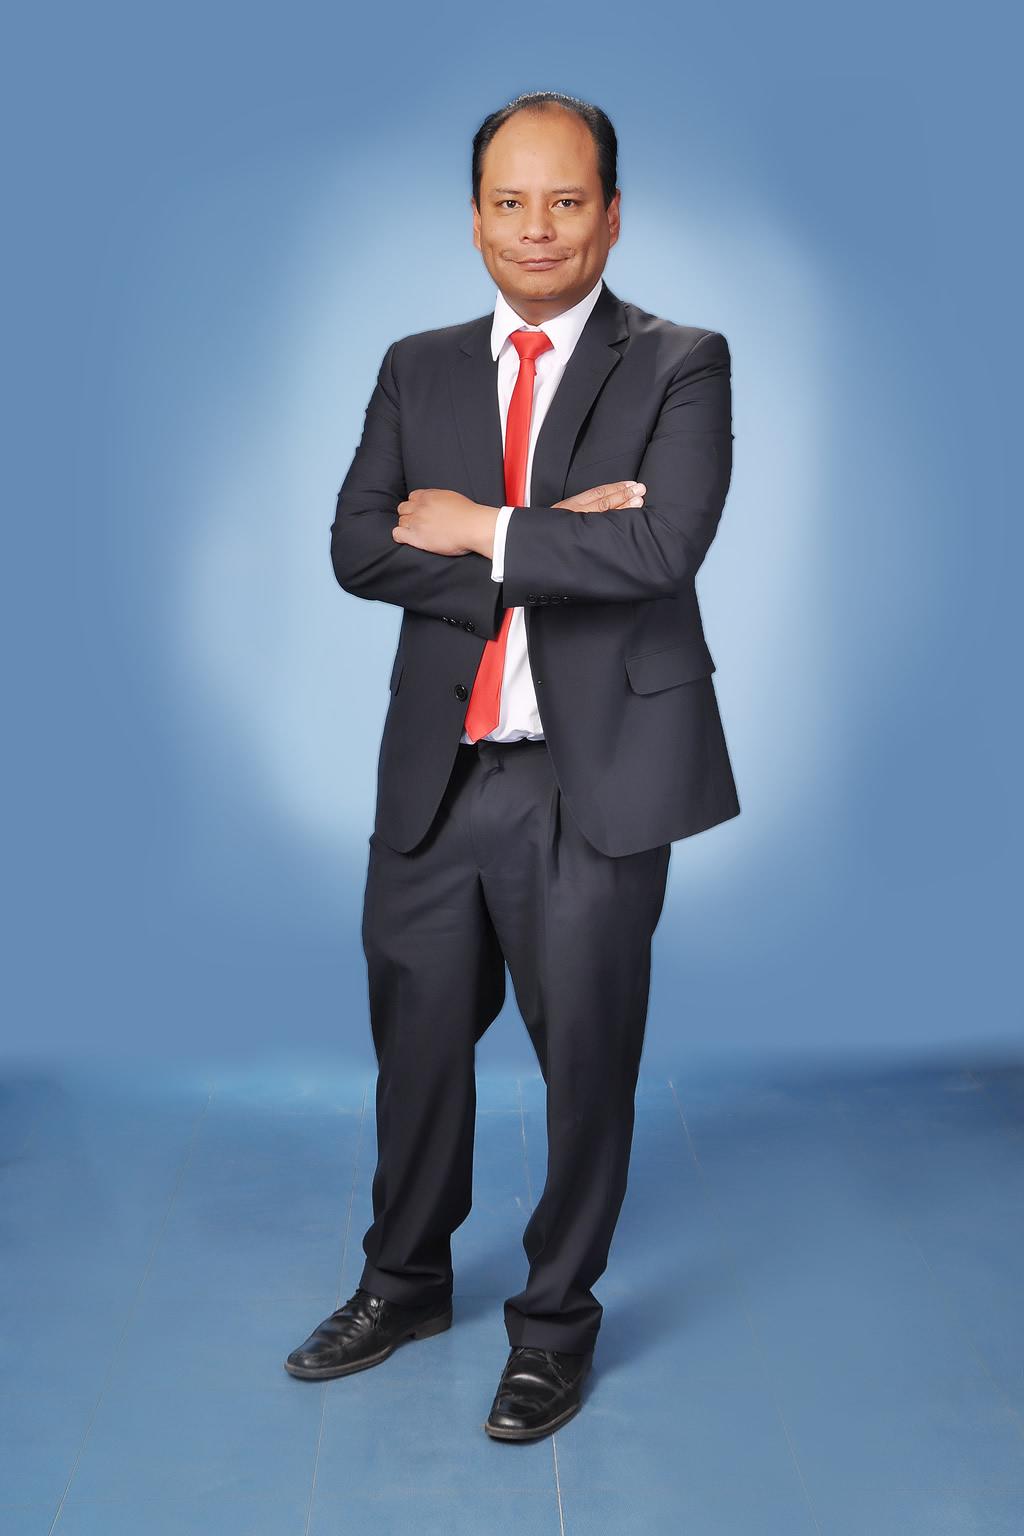 Dr. Hugo Martín Sánchez Rodrigo